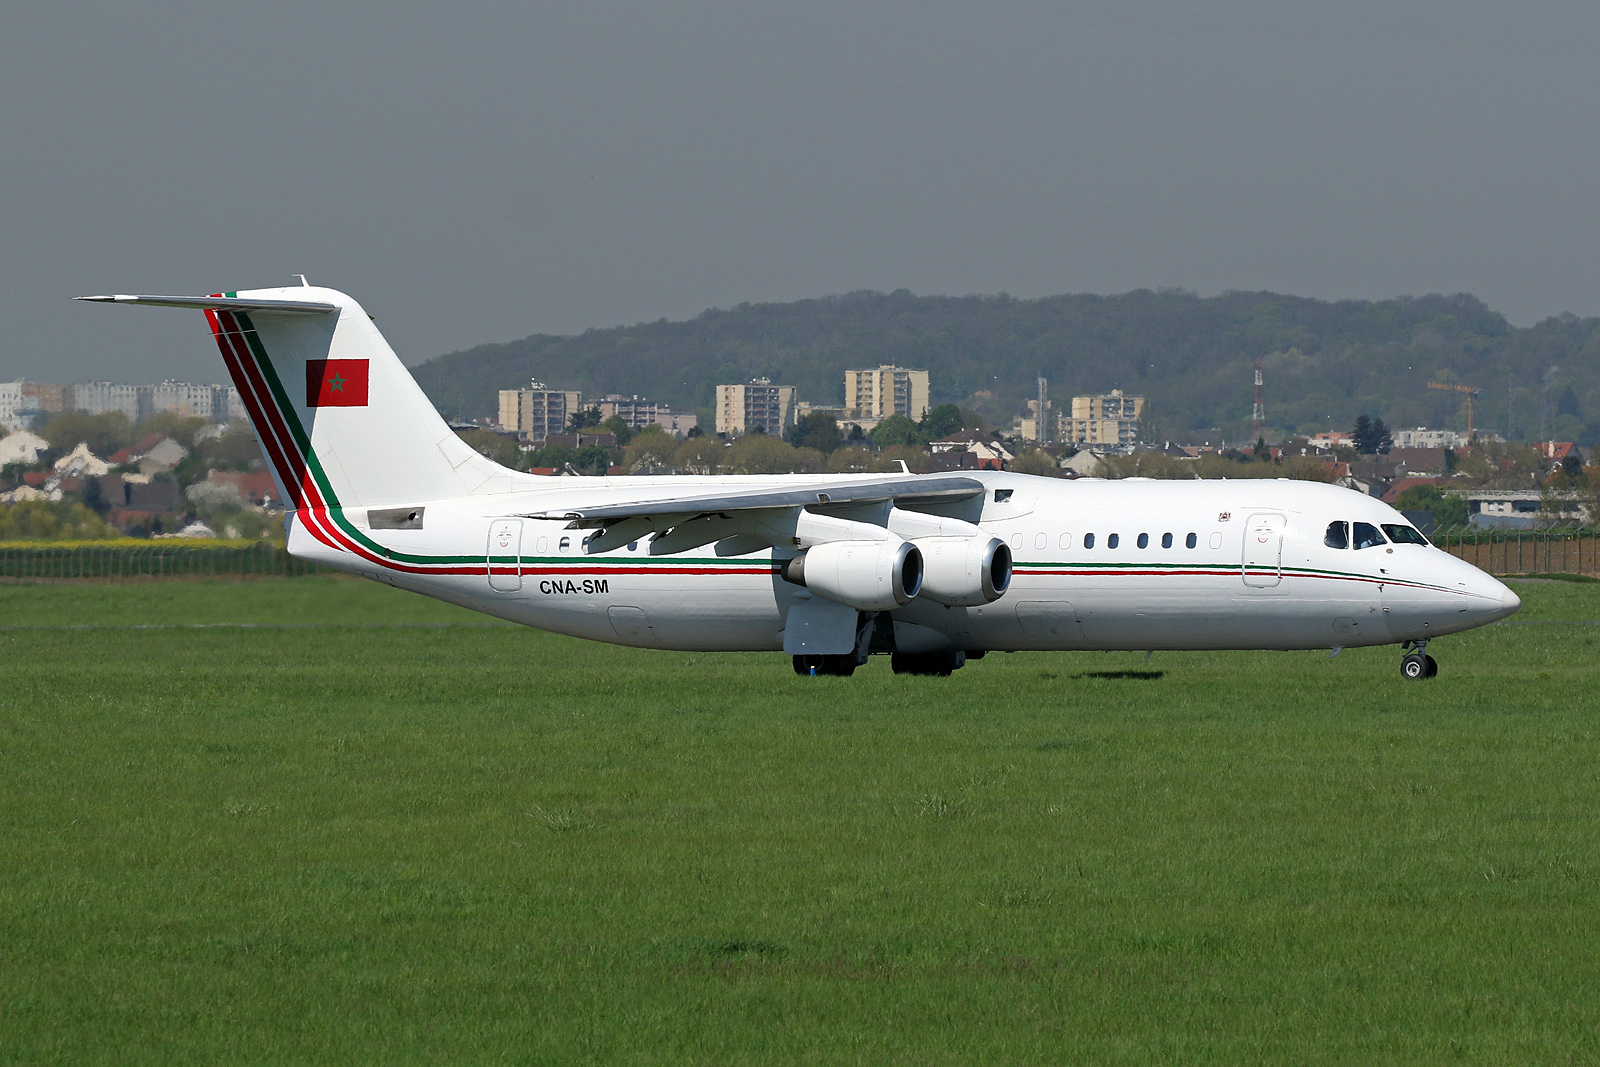 FRA: Avions VIP, Liaison & ECM - Page 19 40857527384_1e15aab38e_o